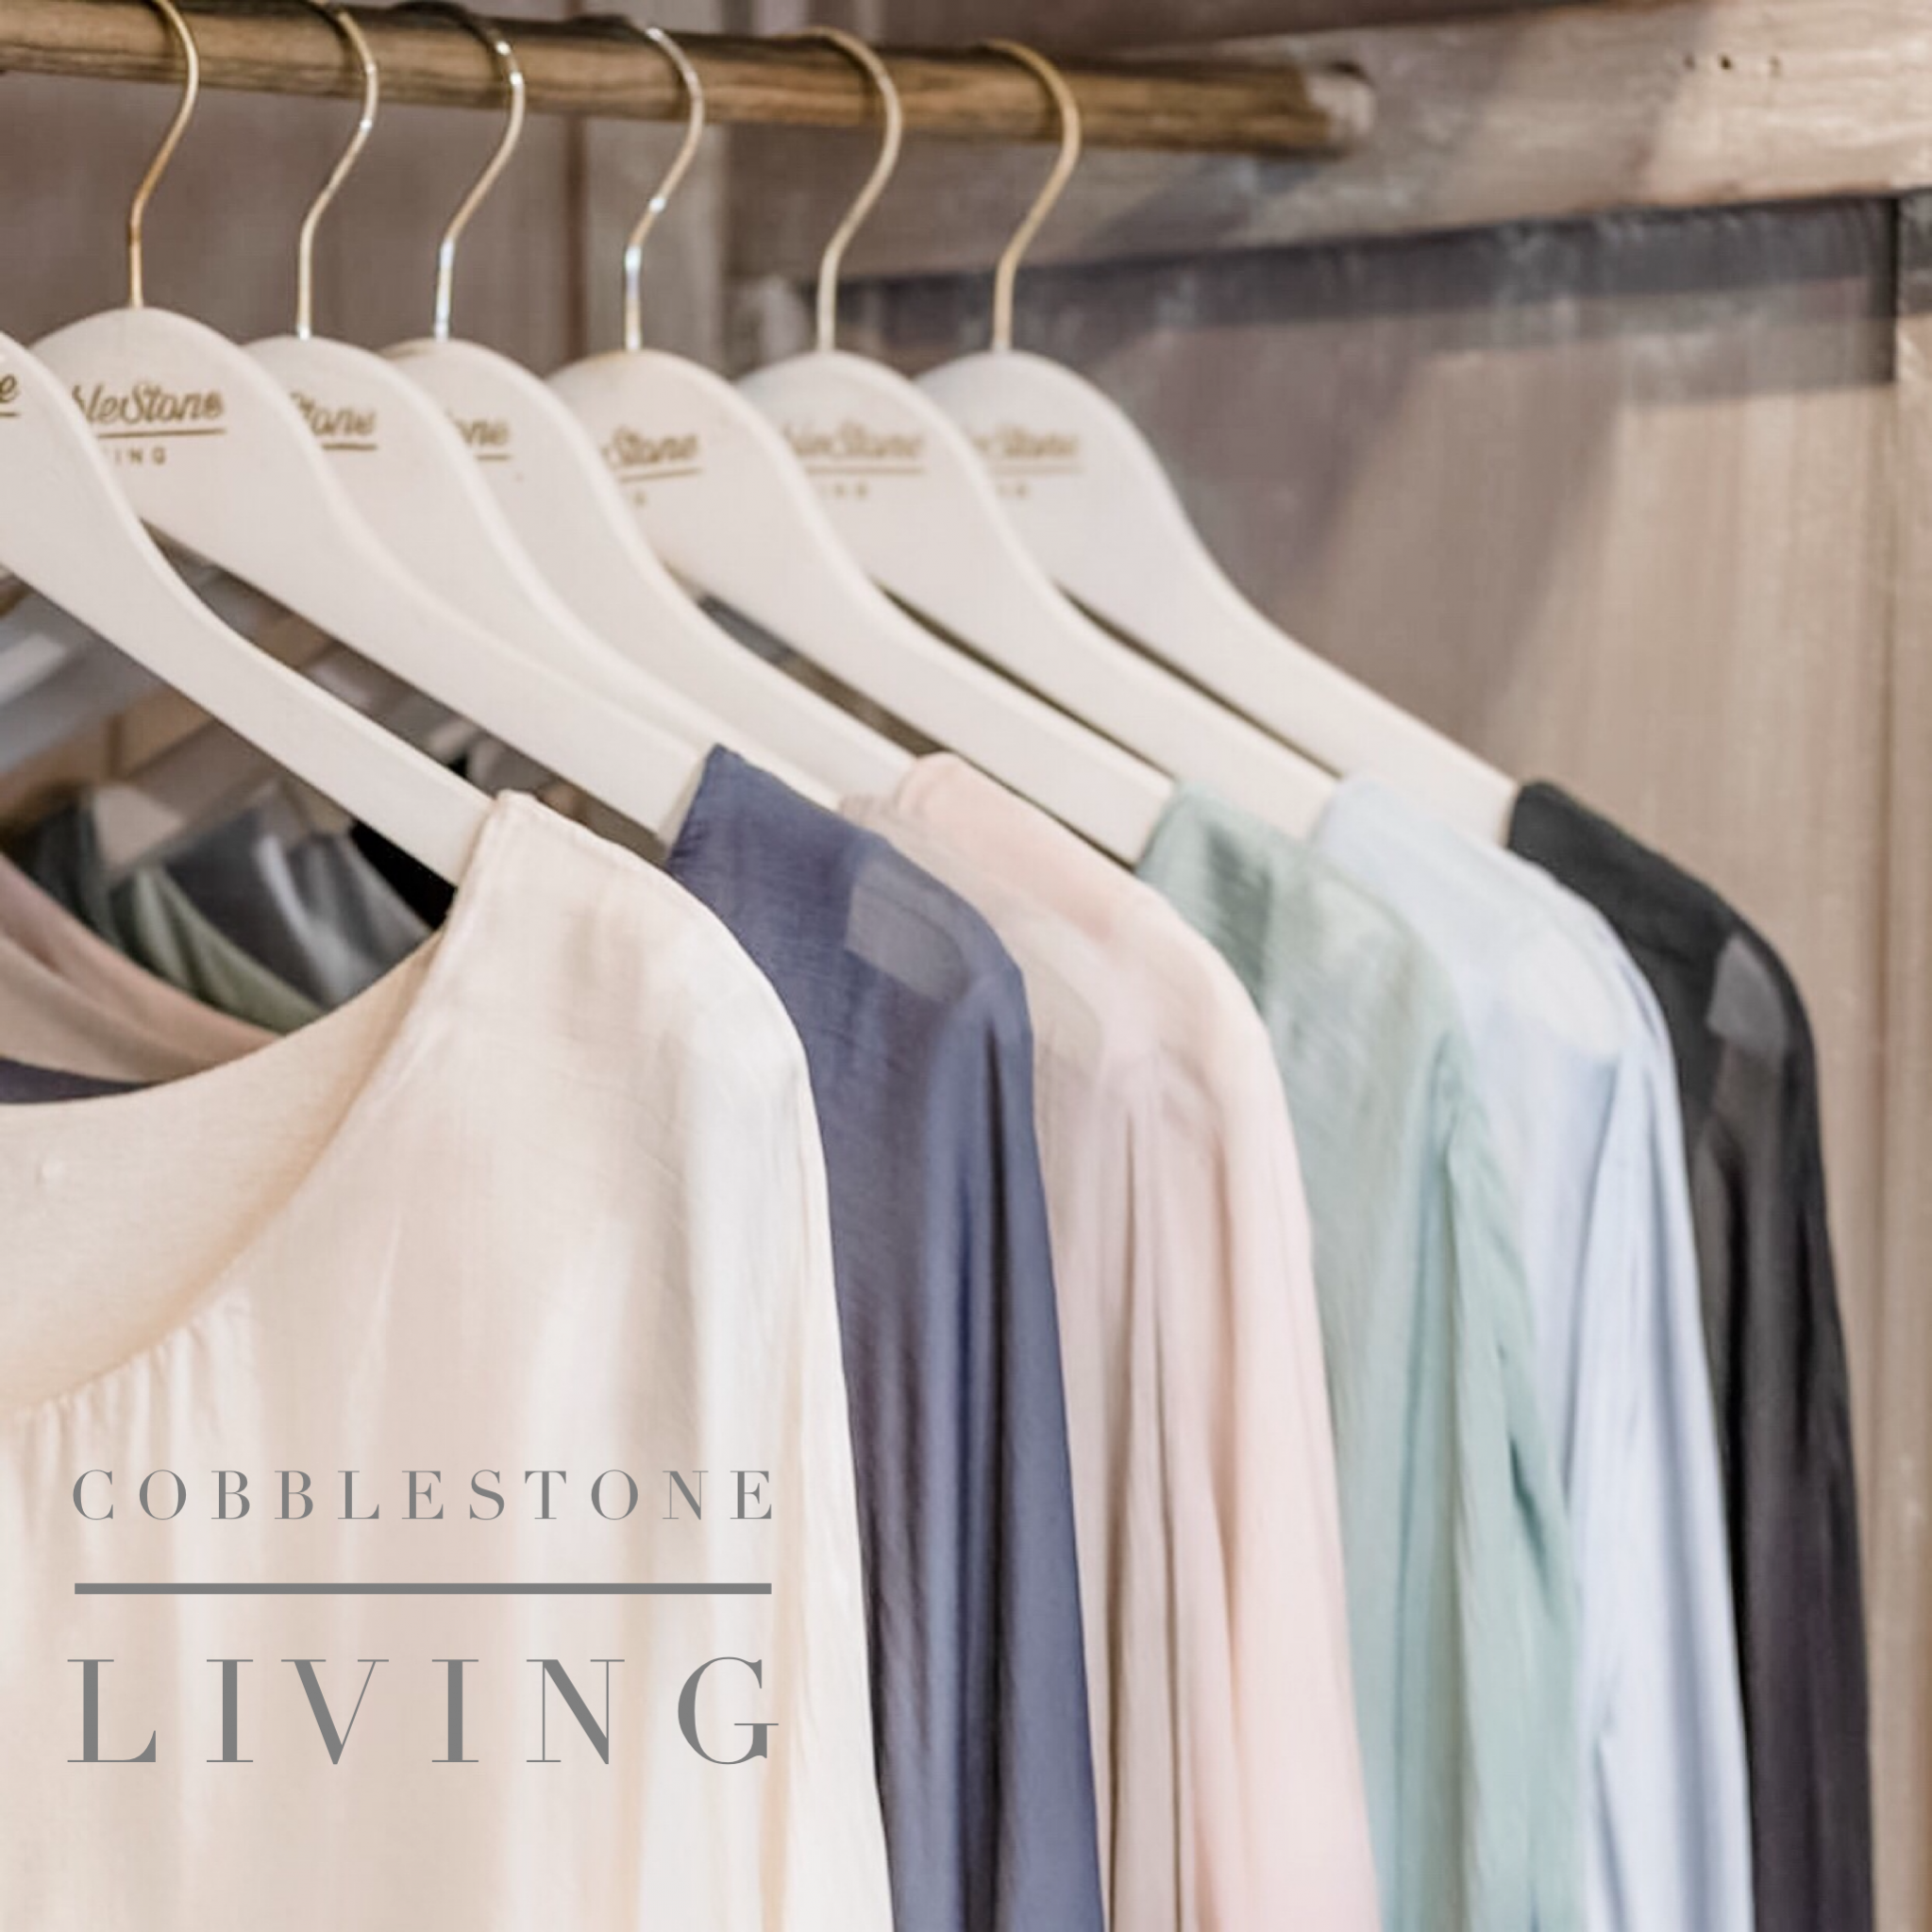 Cobblestone Living